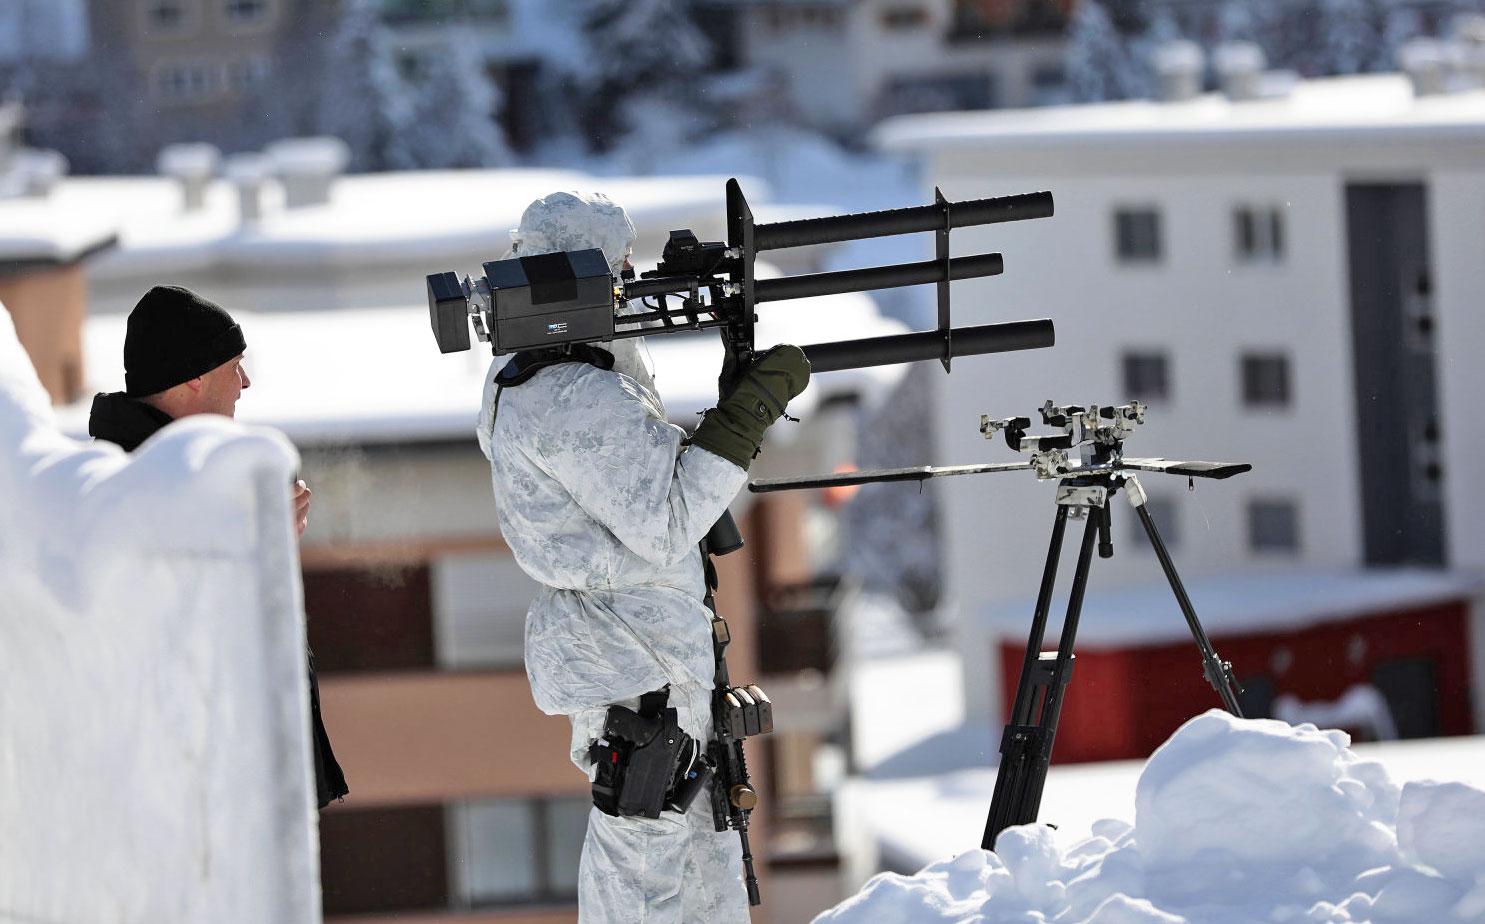 Swiss Cops Use Anti Drone Guns At The World Economic Forum